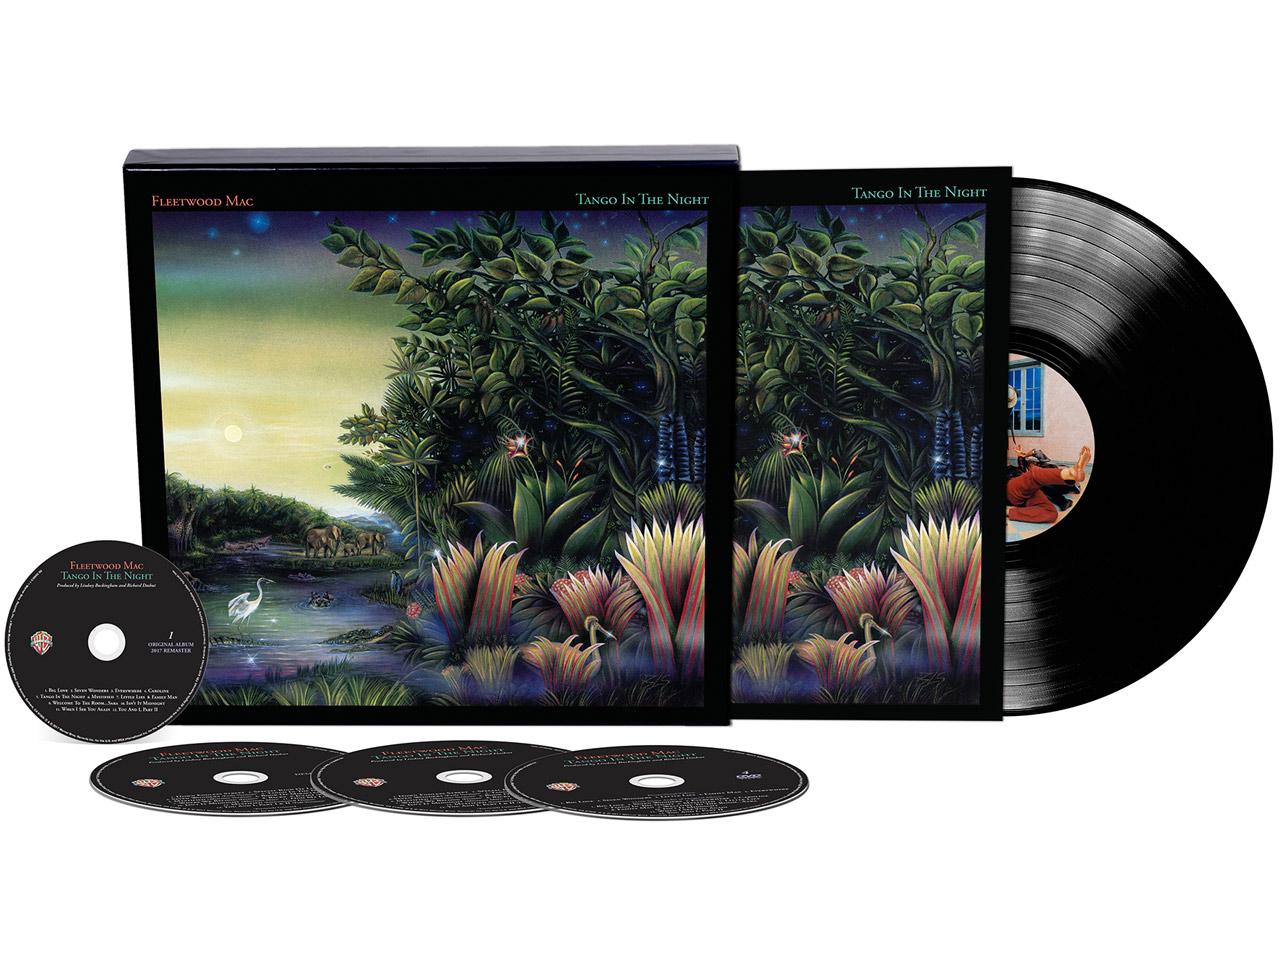 Win Fleetwood Mac Tango In The Night Deluxe Edition